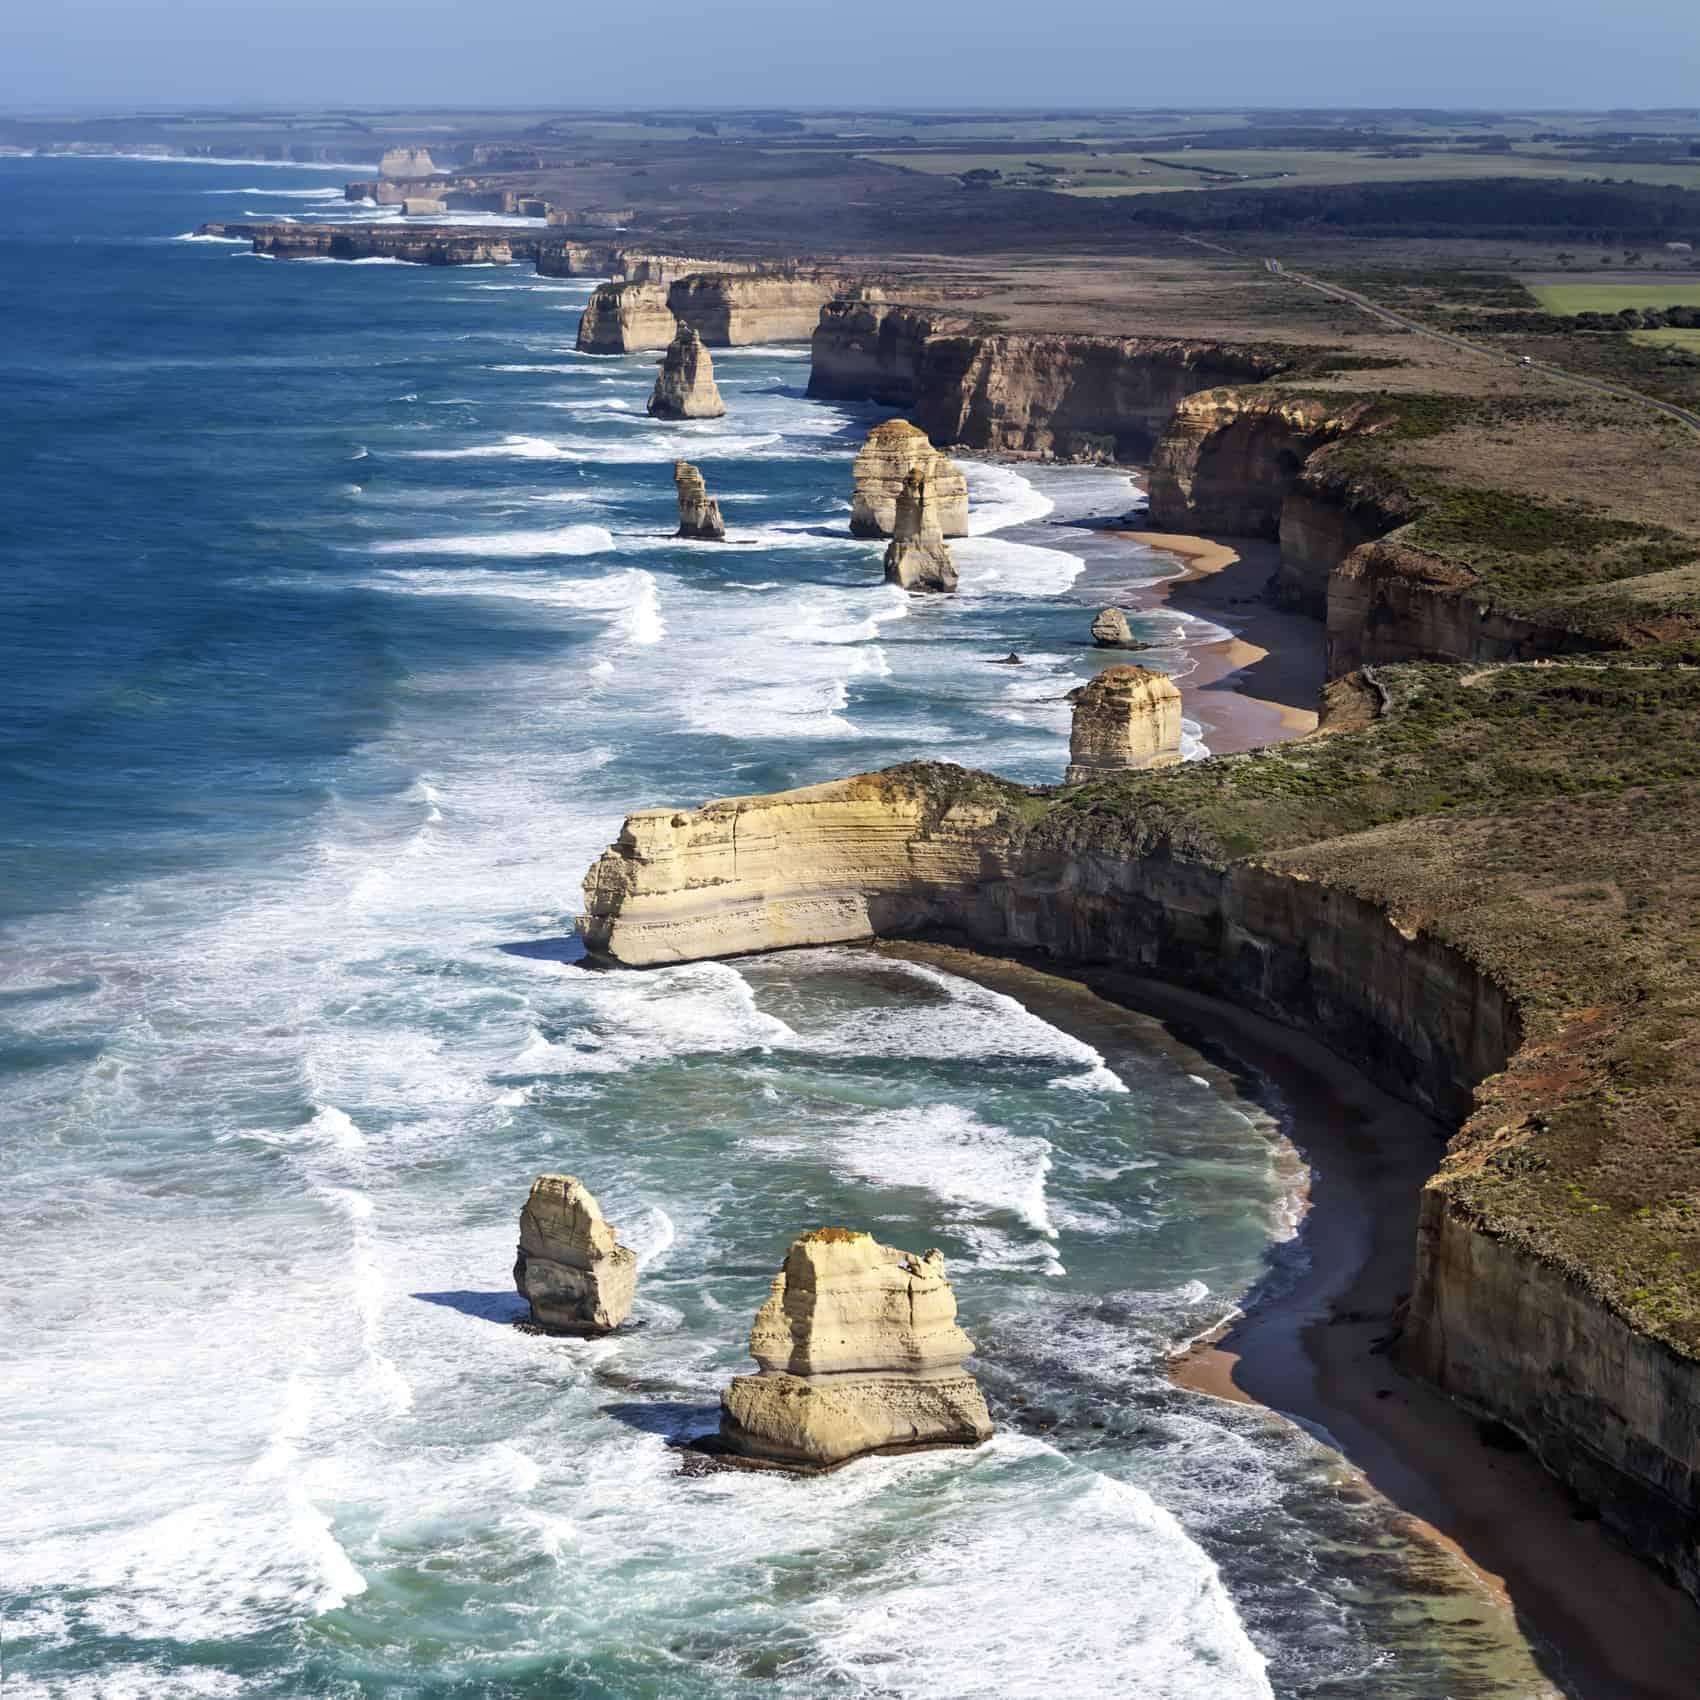 Twelve Apostles, Victoria, Australia, viewed from the air.